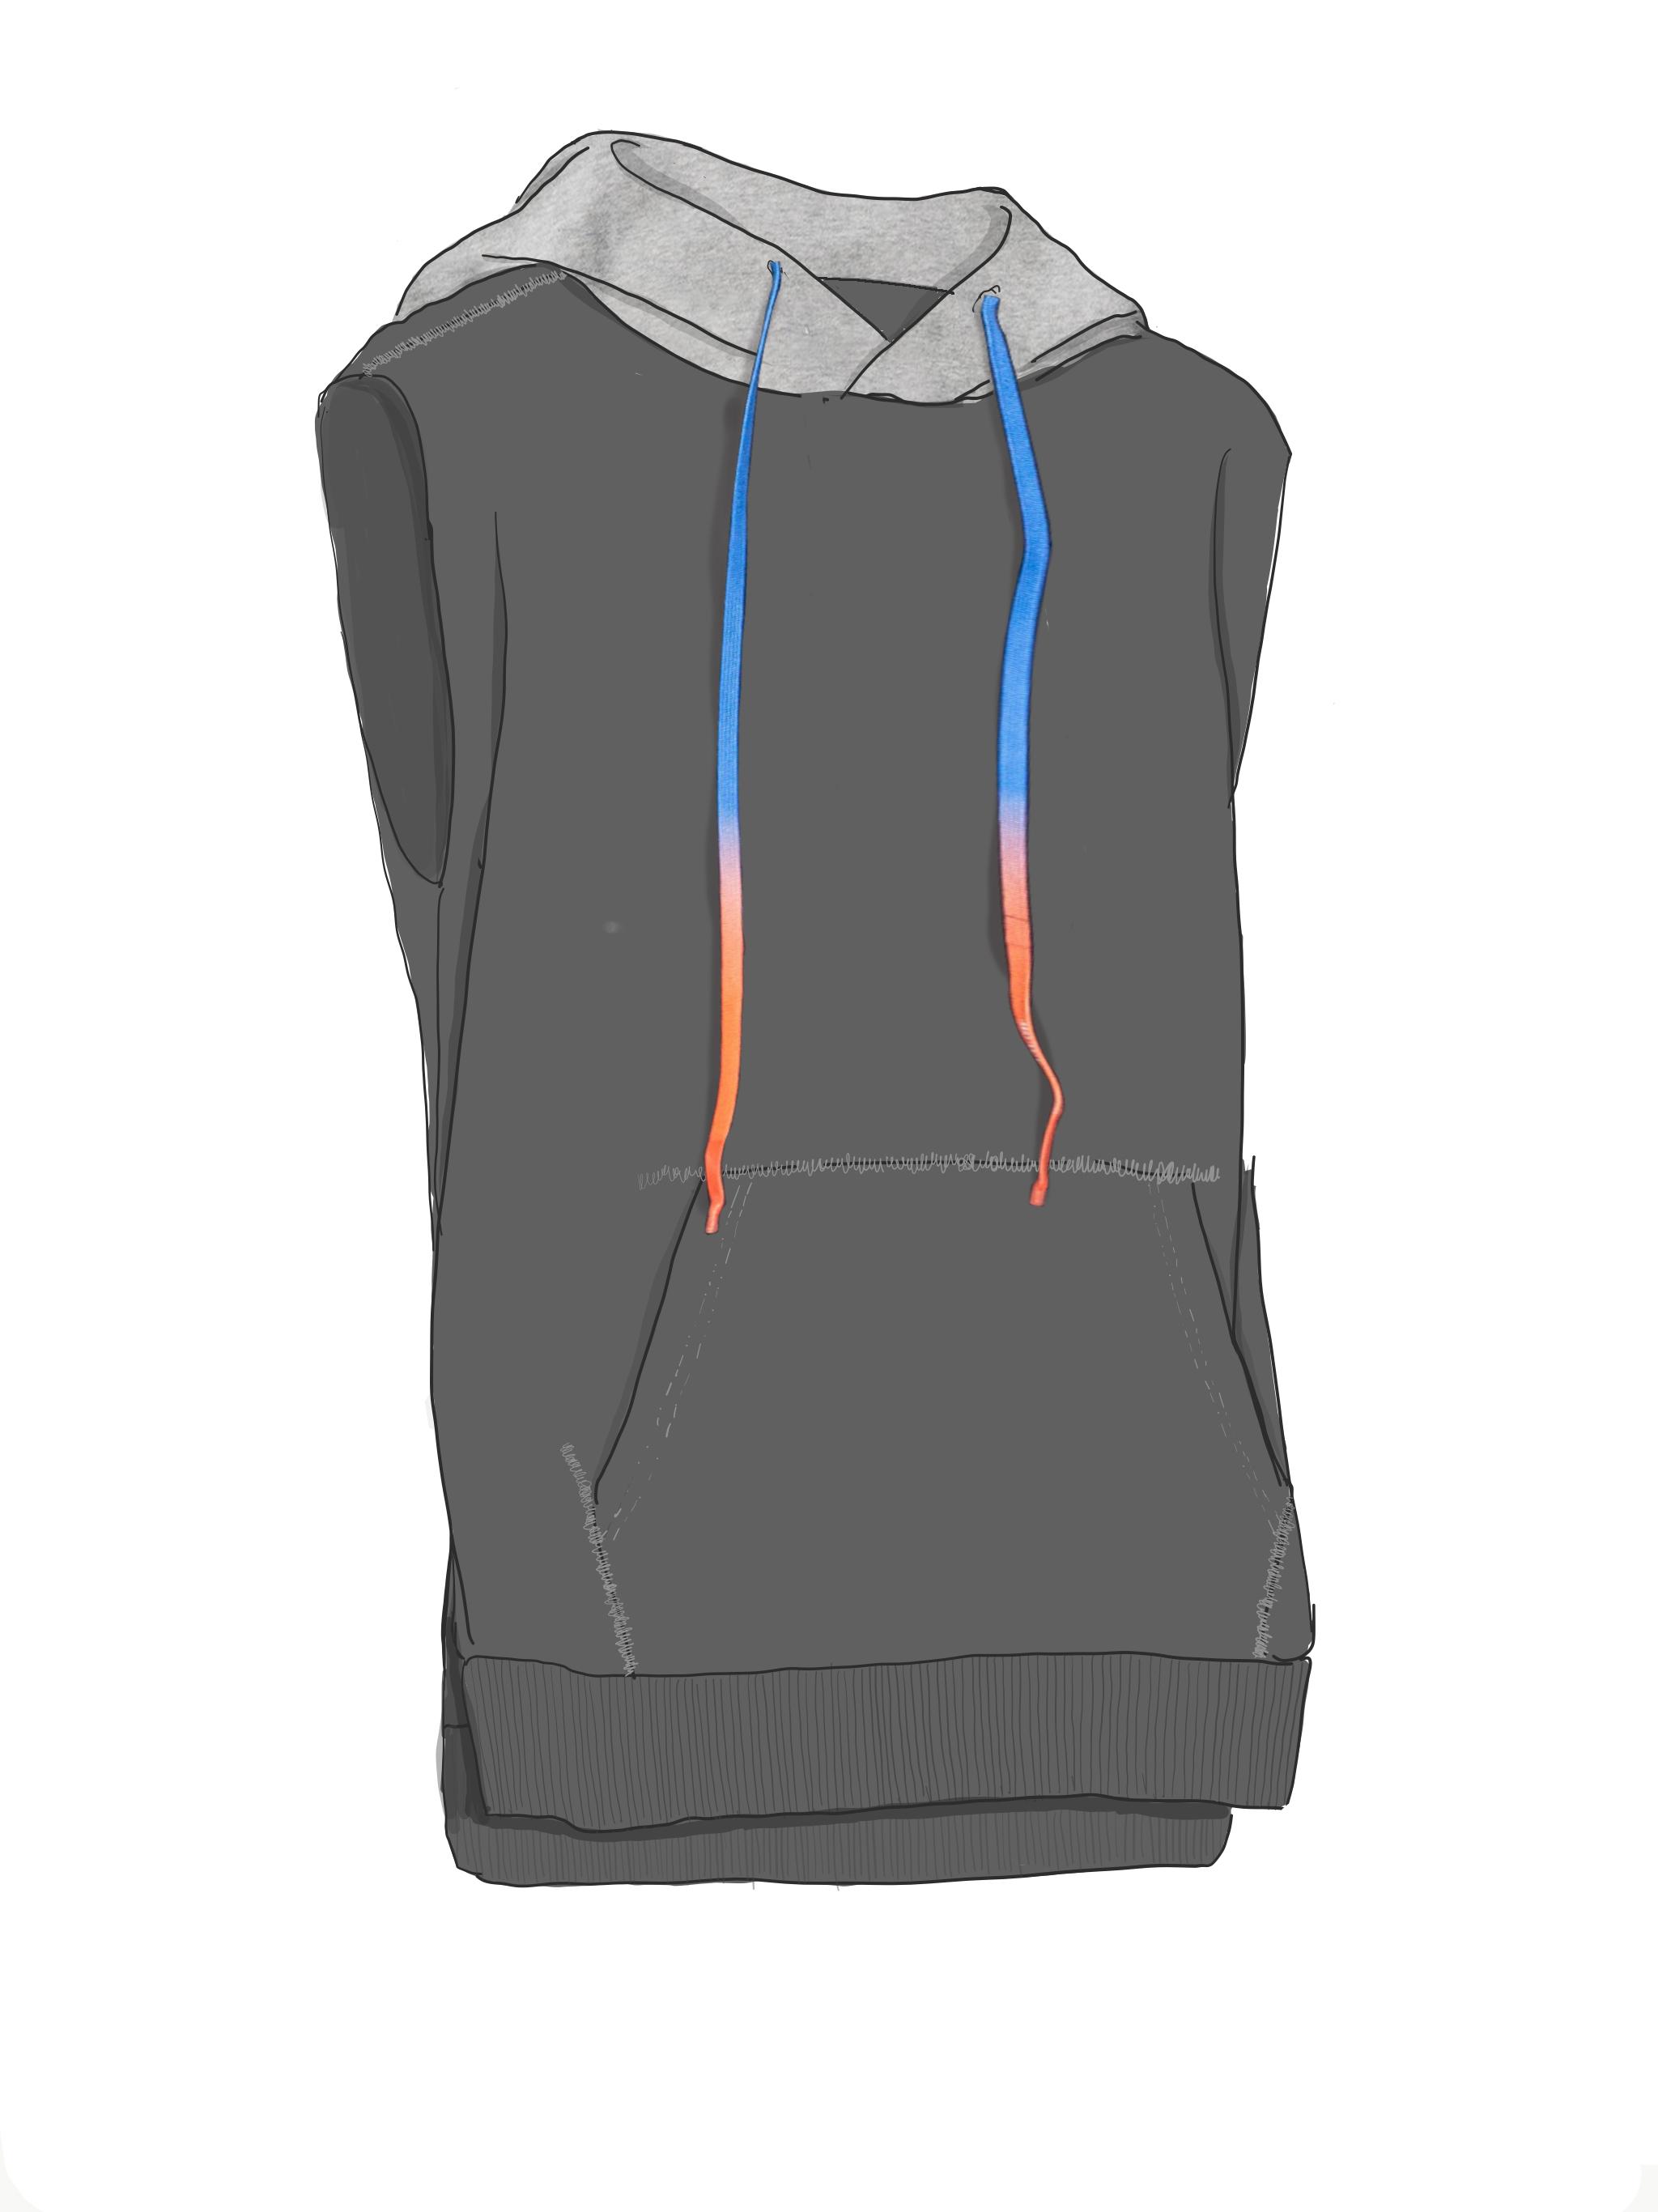 sleeveless hoodie-Recovered.jpg